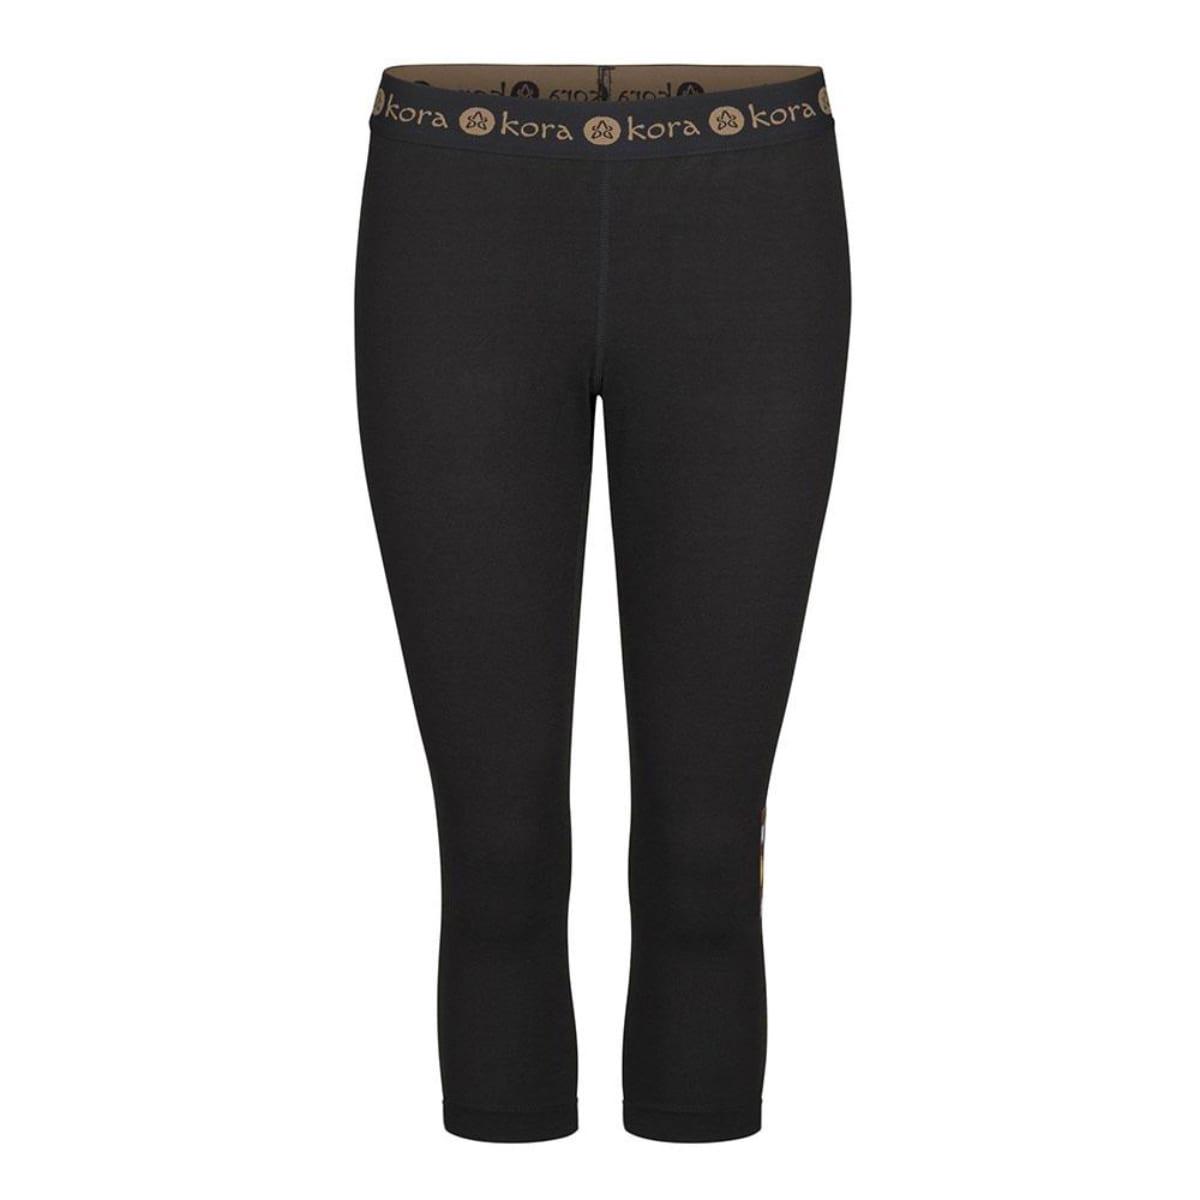 Kora women's base layer bottoms black